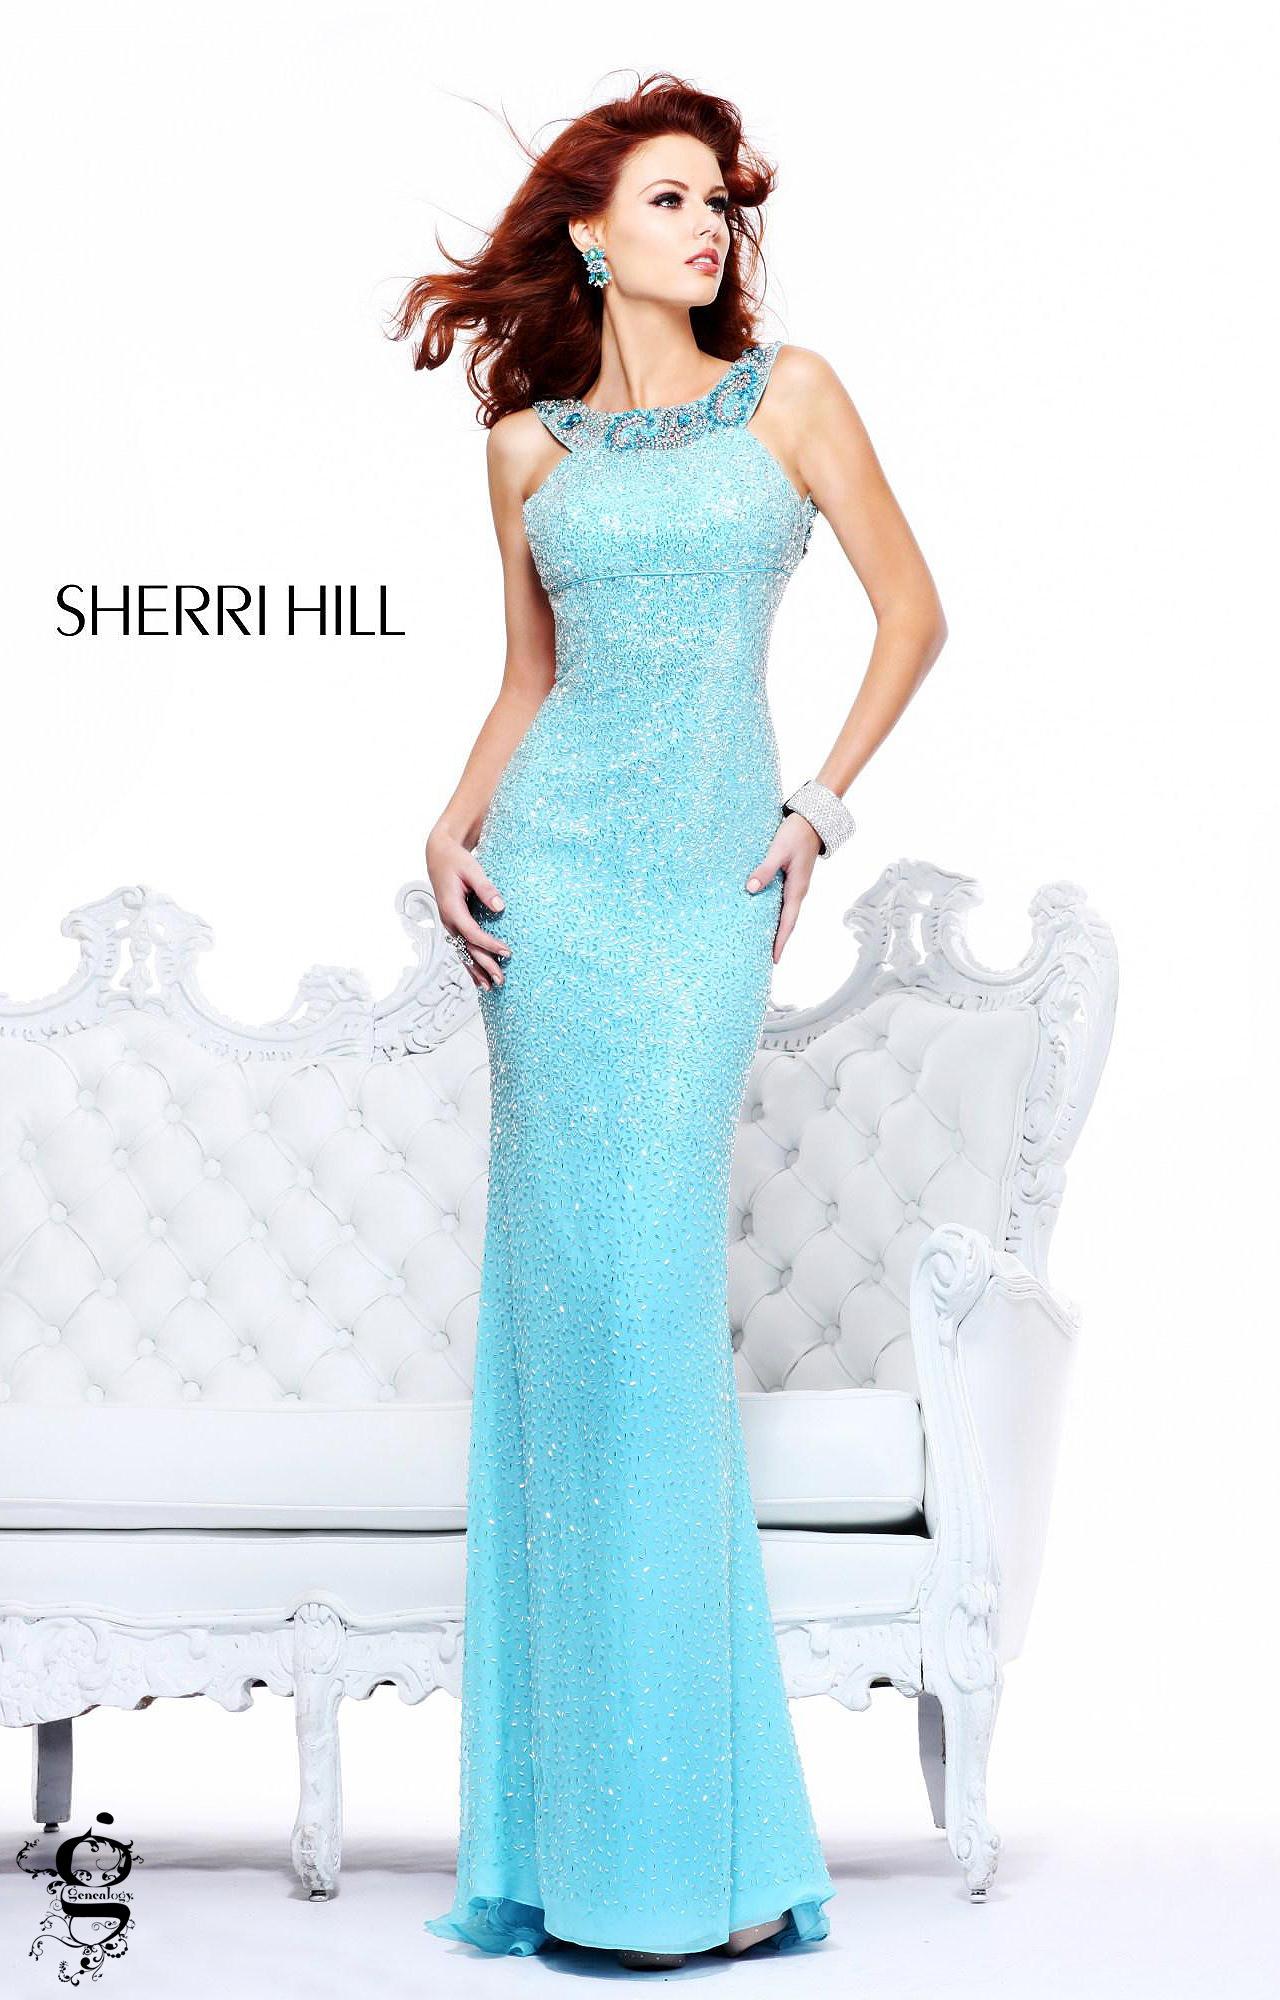 Luxury Prom Dresses Sherri Hill 2013 Sketch - All Wedding Dresses ...